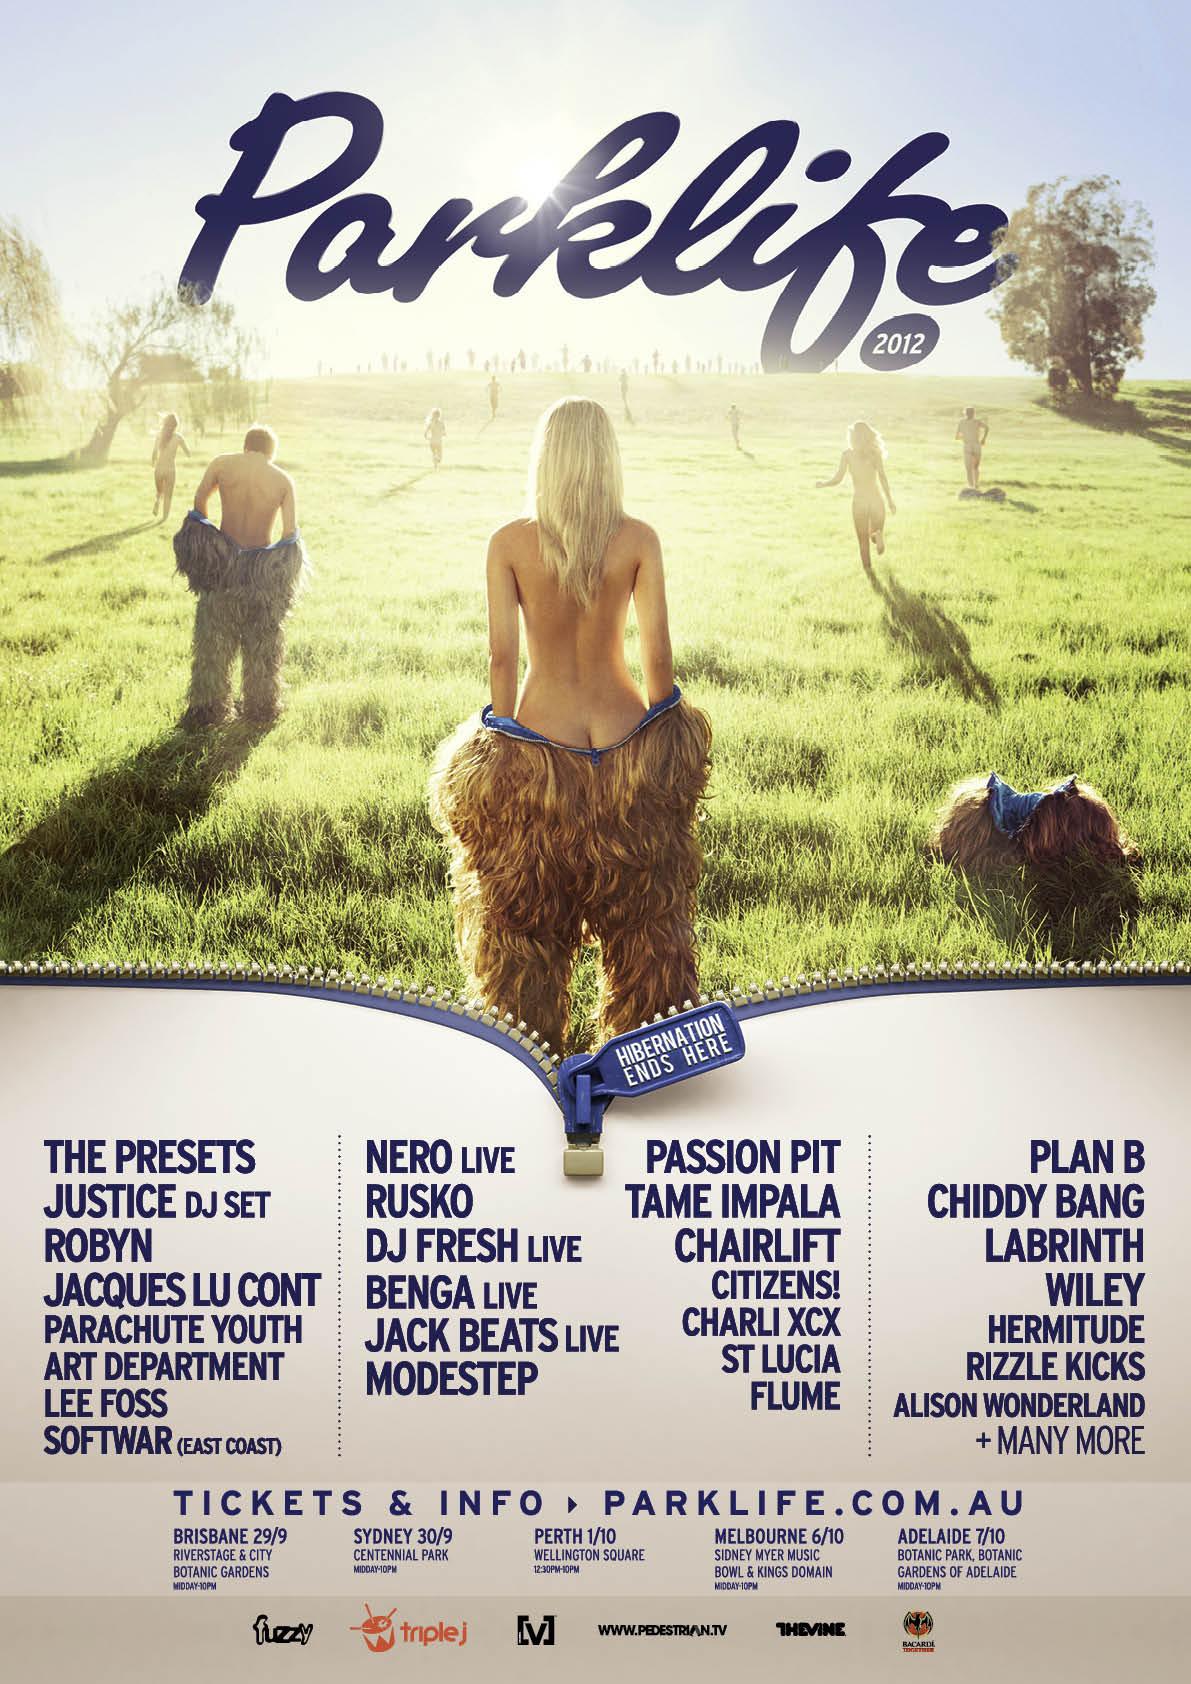 Parklife 2012 Poster